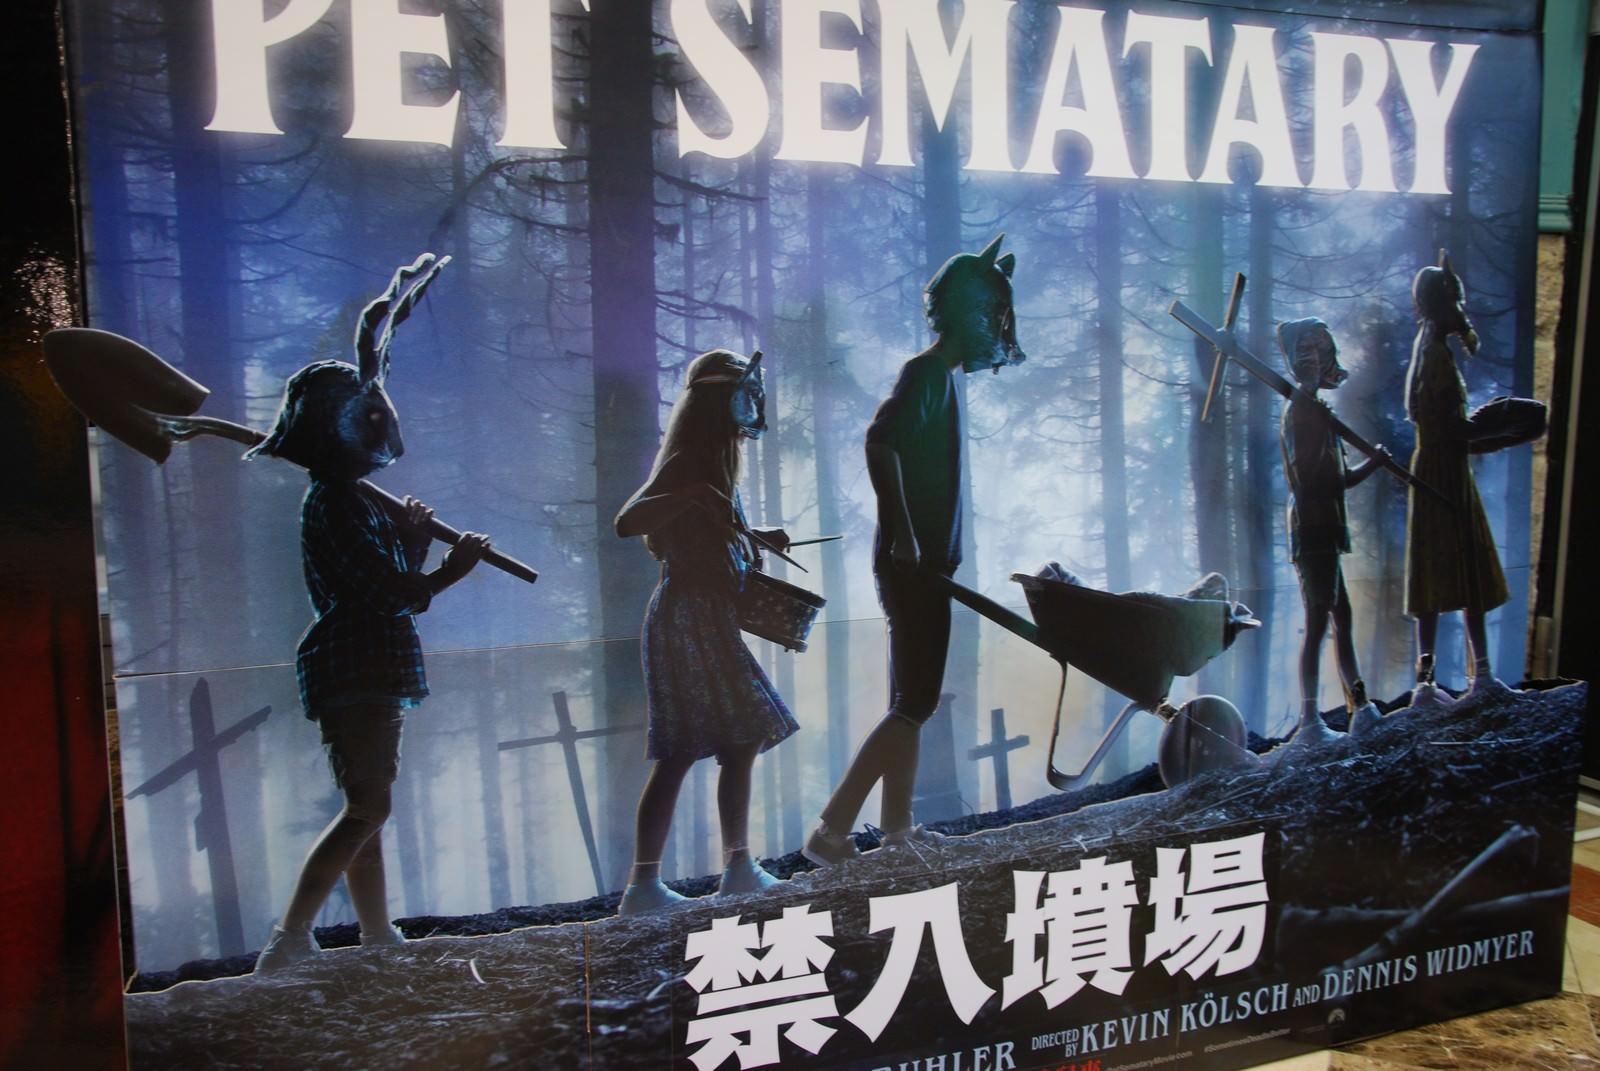 Movie, Pet Sematary(美國, 2019年) / 禁入墳場(台灣) / 詭墓(香港) / 宠物坟场(網路), 廣告看板, 哈啦影城